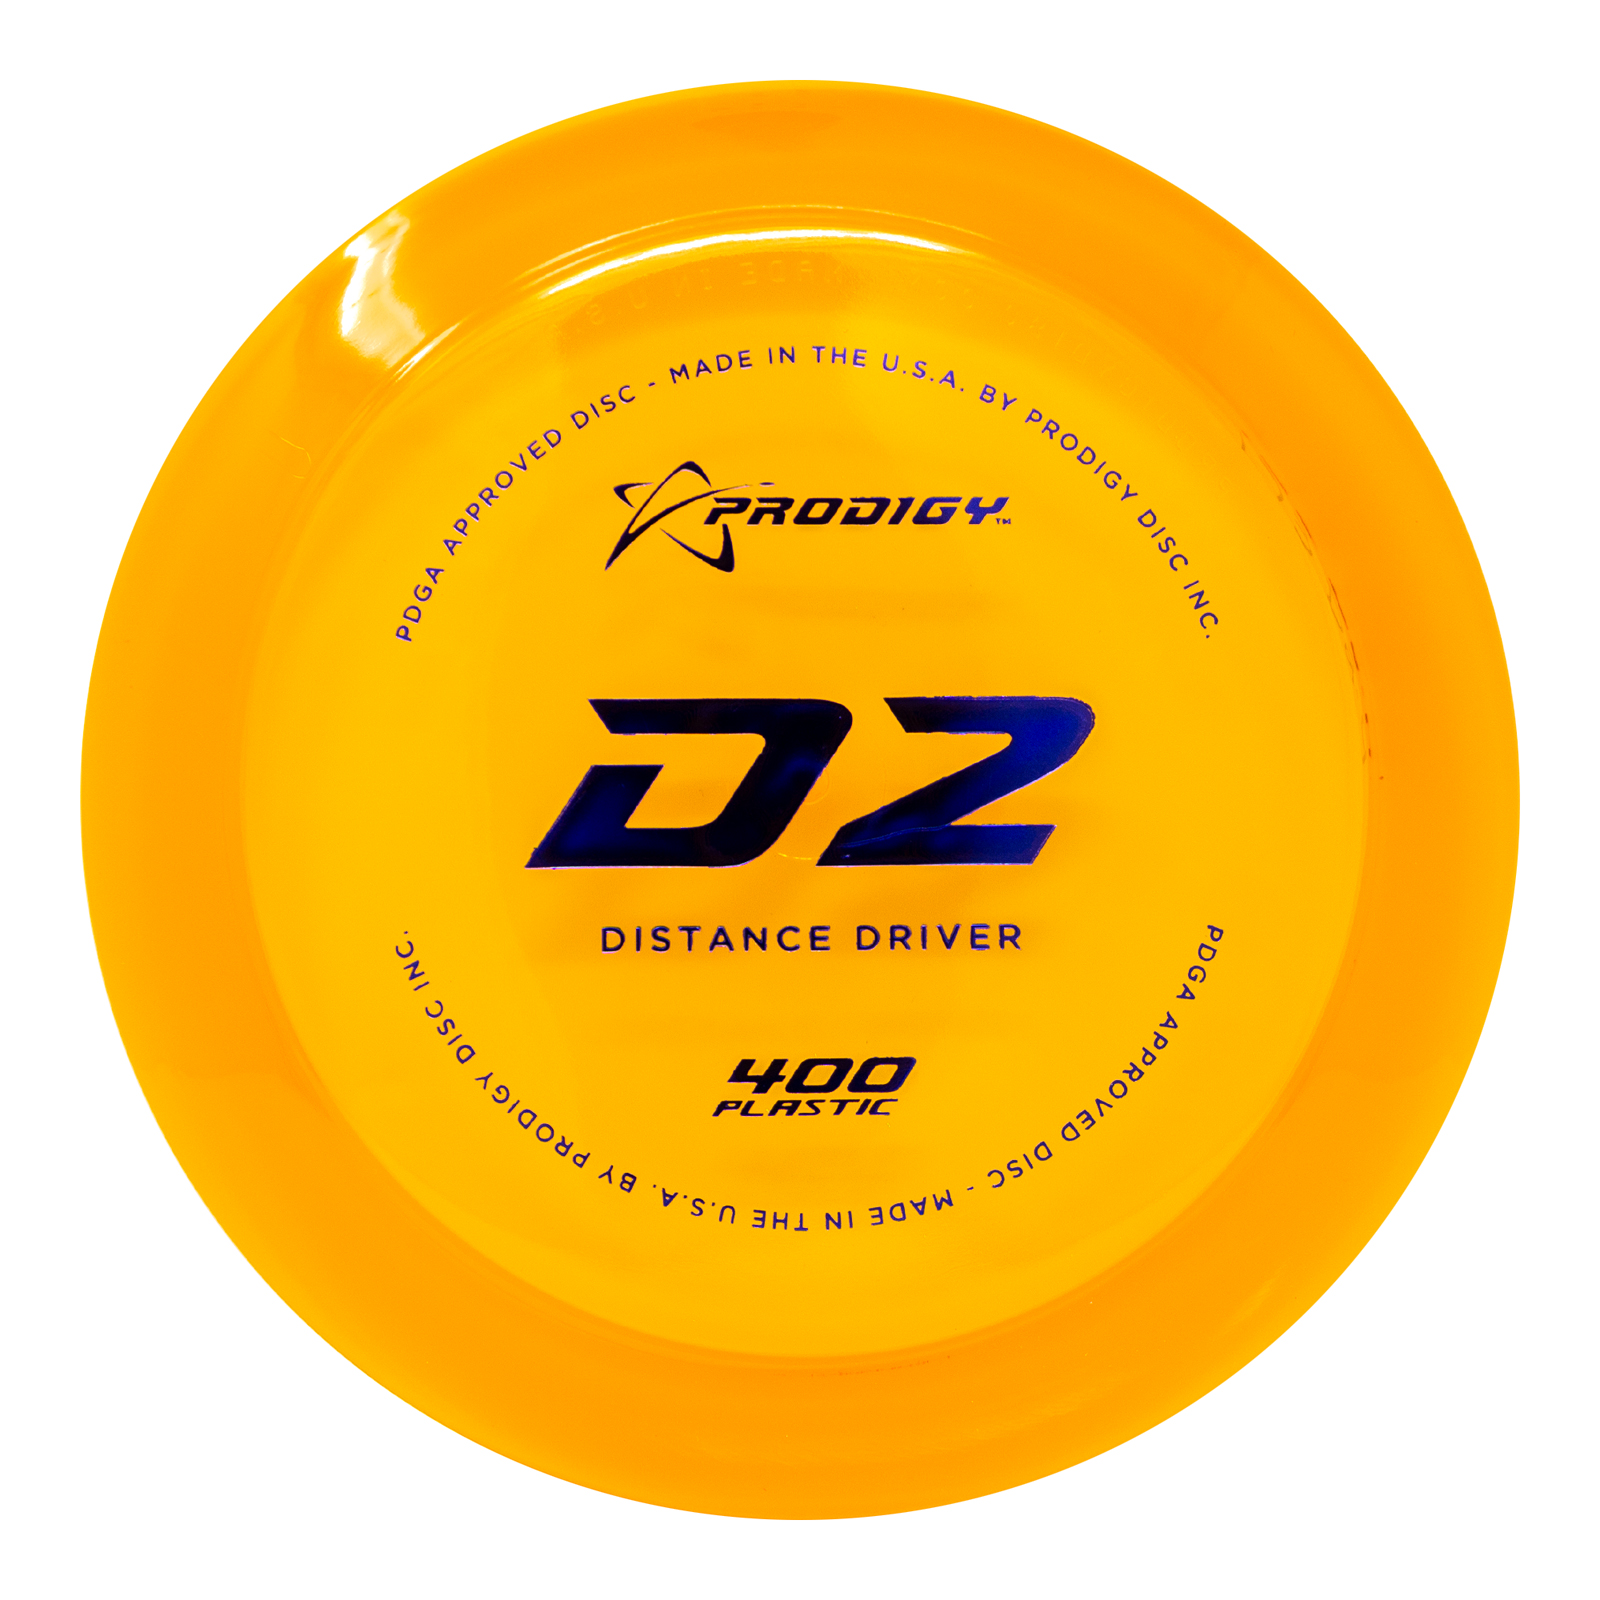 D2 - 400 PLASTIC